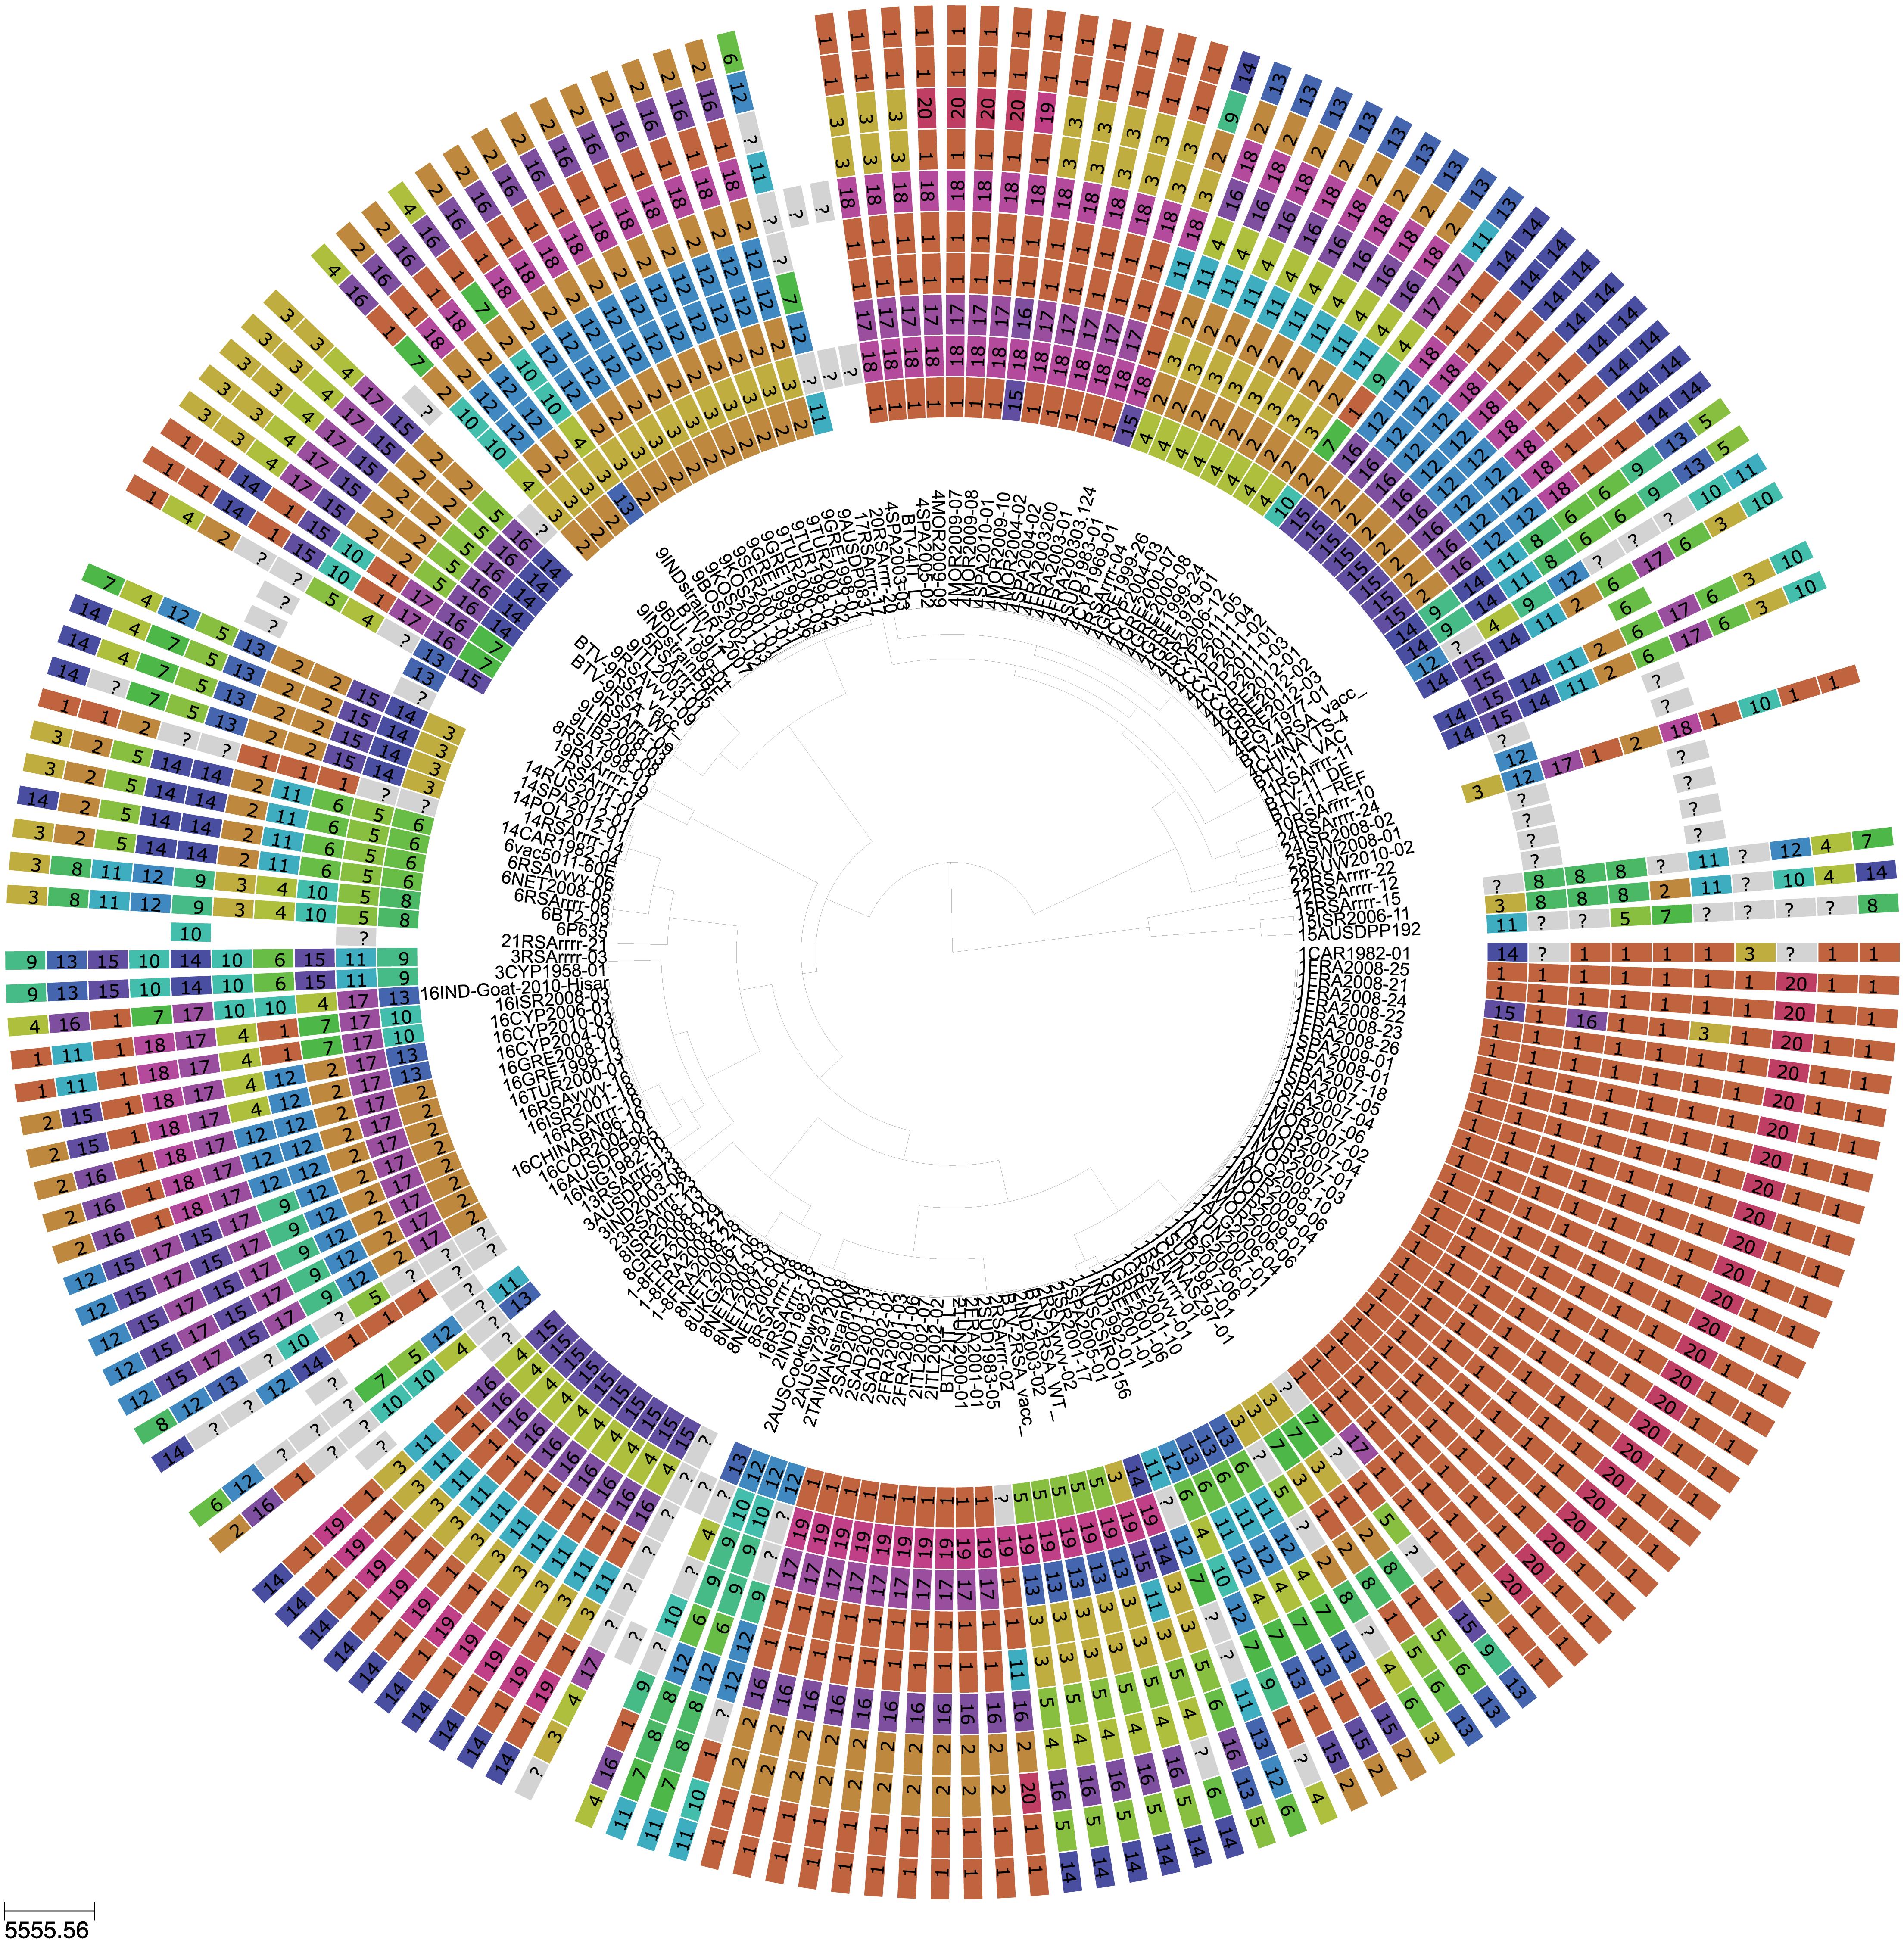 Phylogeny of BTV Seg-2 and inferred genomic reassortment patterns.